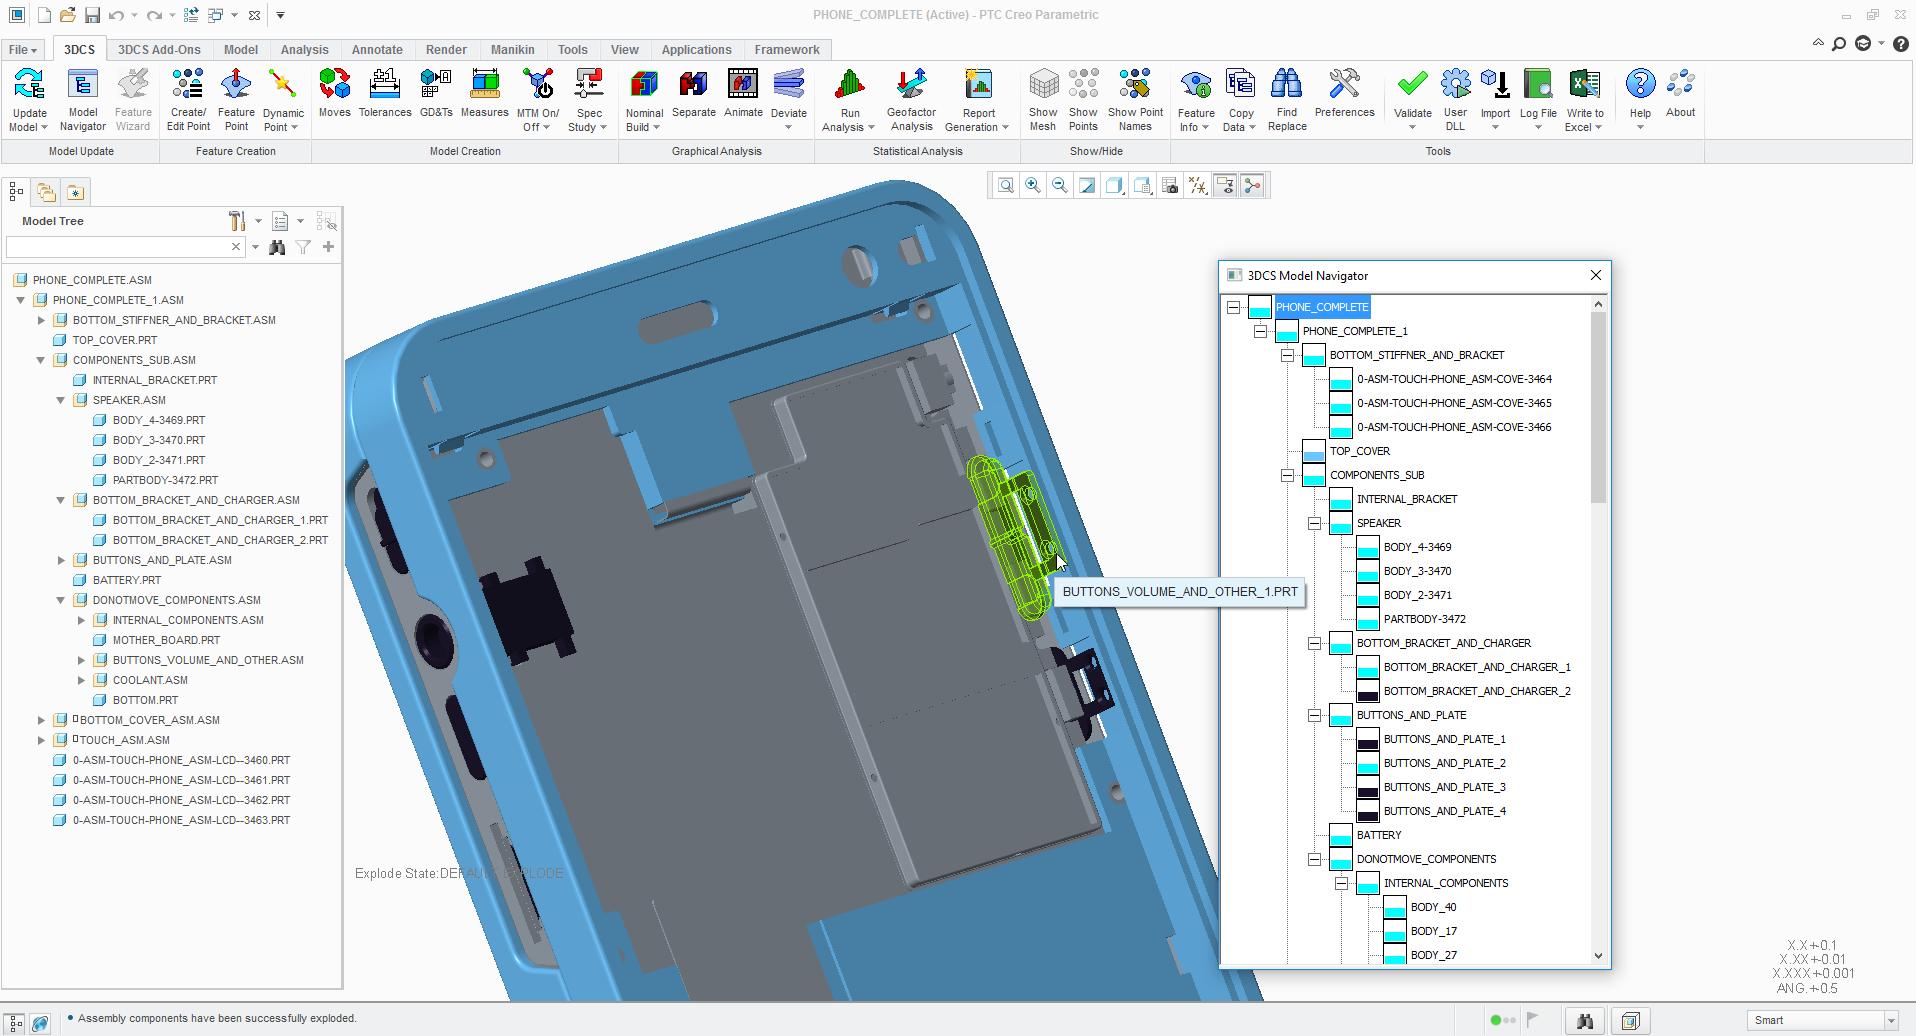 3DCS for Creo Video Series - Plus FEA Compliant Modeler!